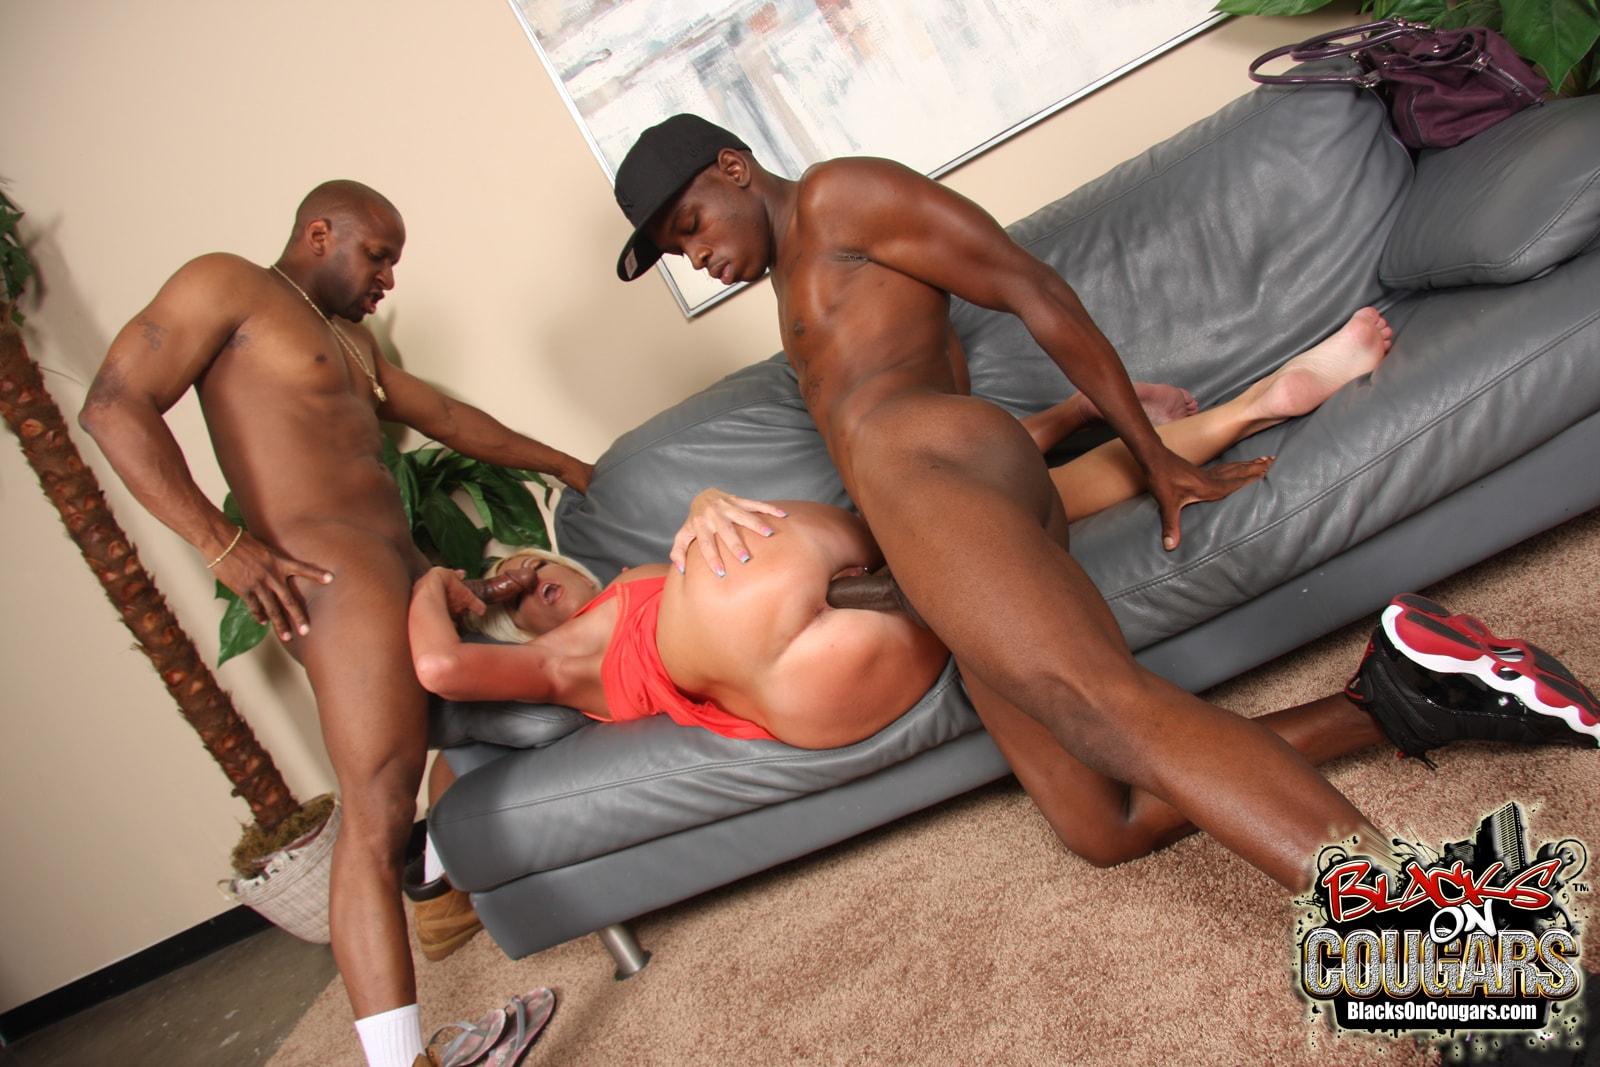 Dogfart '- Blacks On Cougars' starring Jordan Blue (Photo 27)